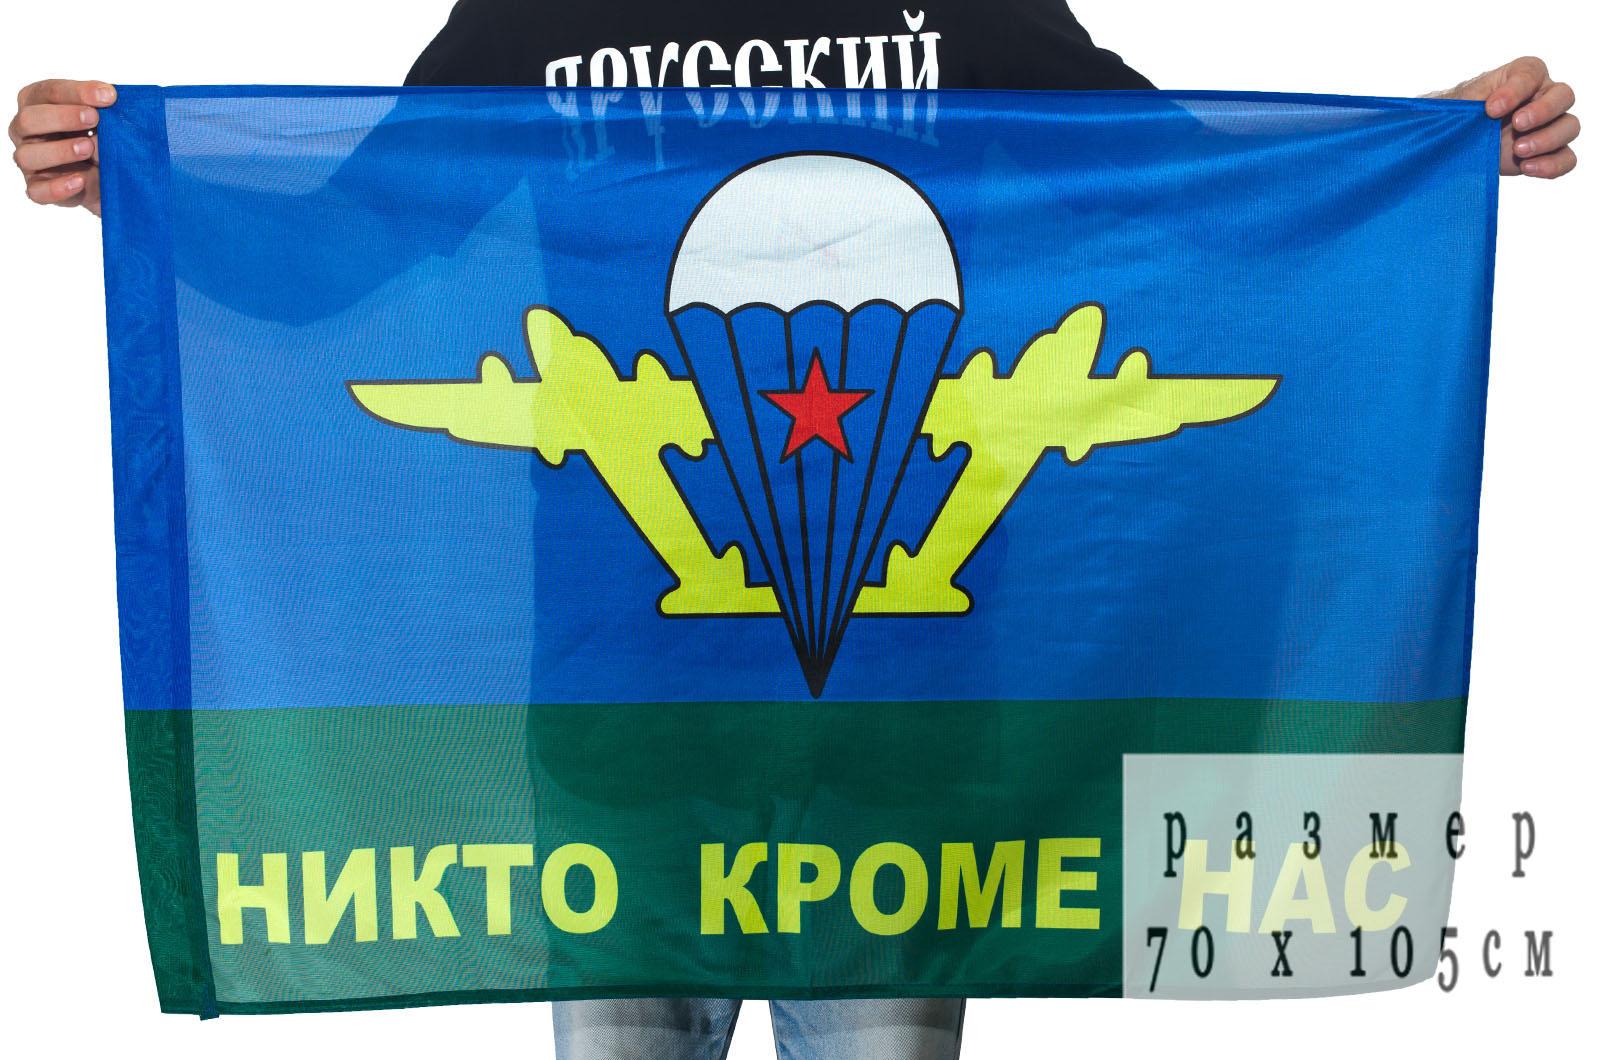 Двухсторонний флаг ВДВ «Никто кроме нас» с белым куполом